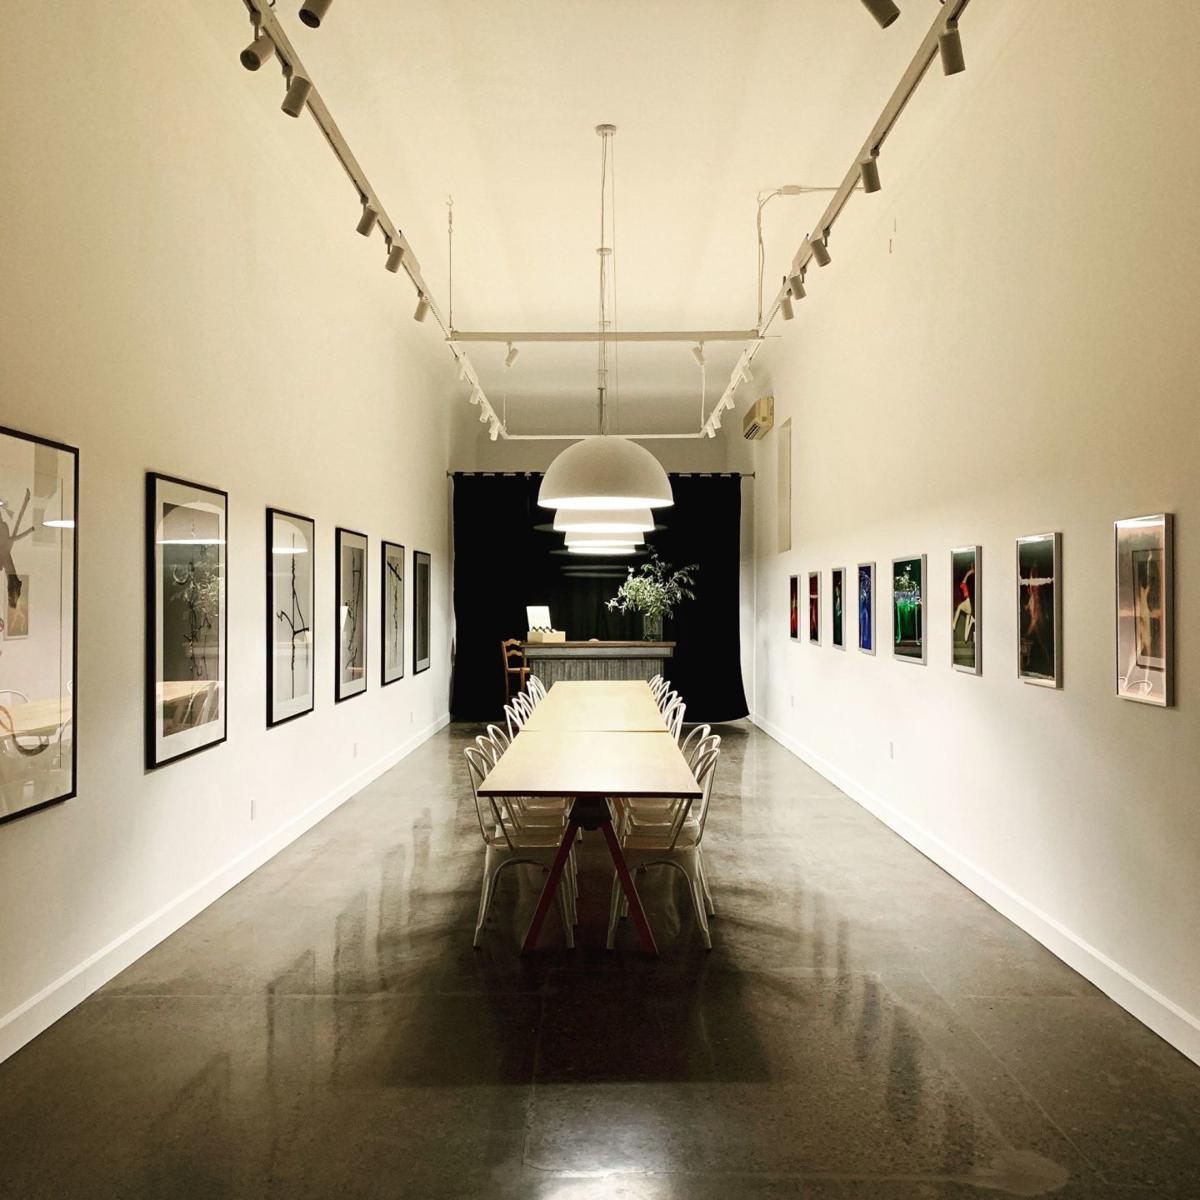 CAMi Gallery & Tasting Room